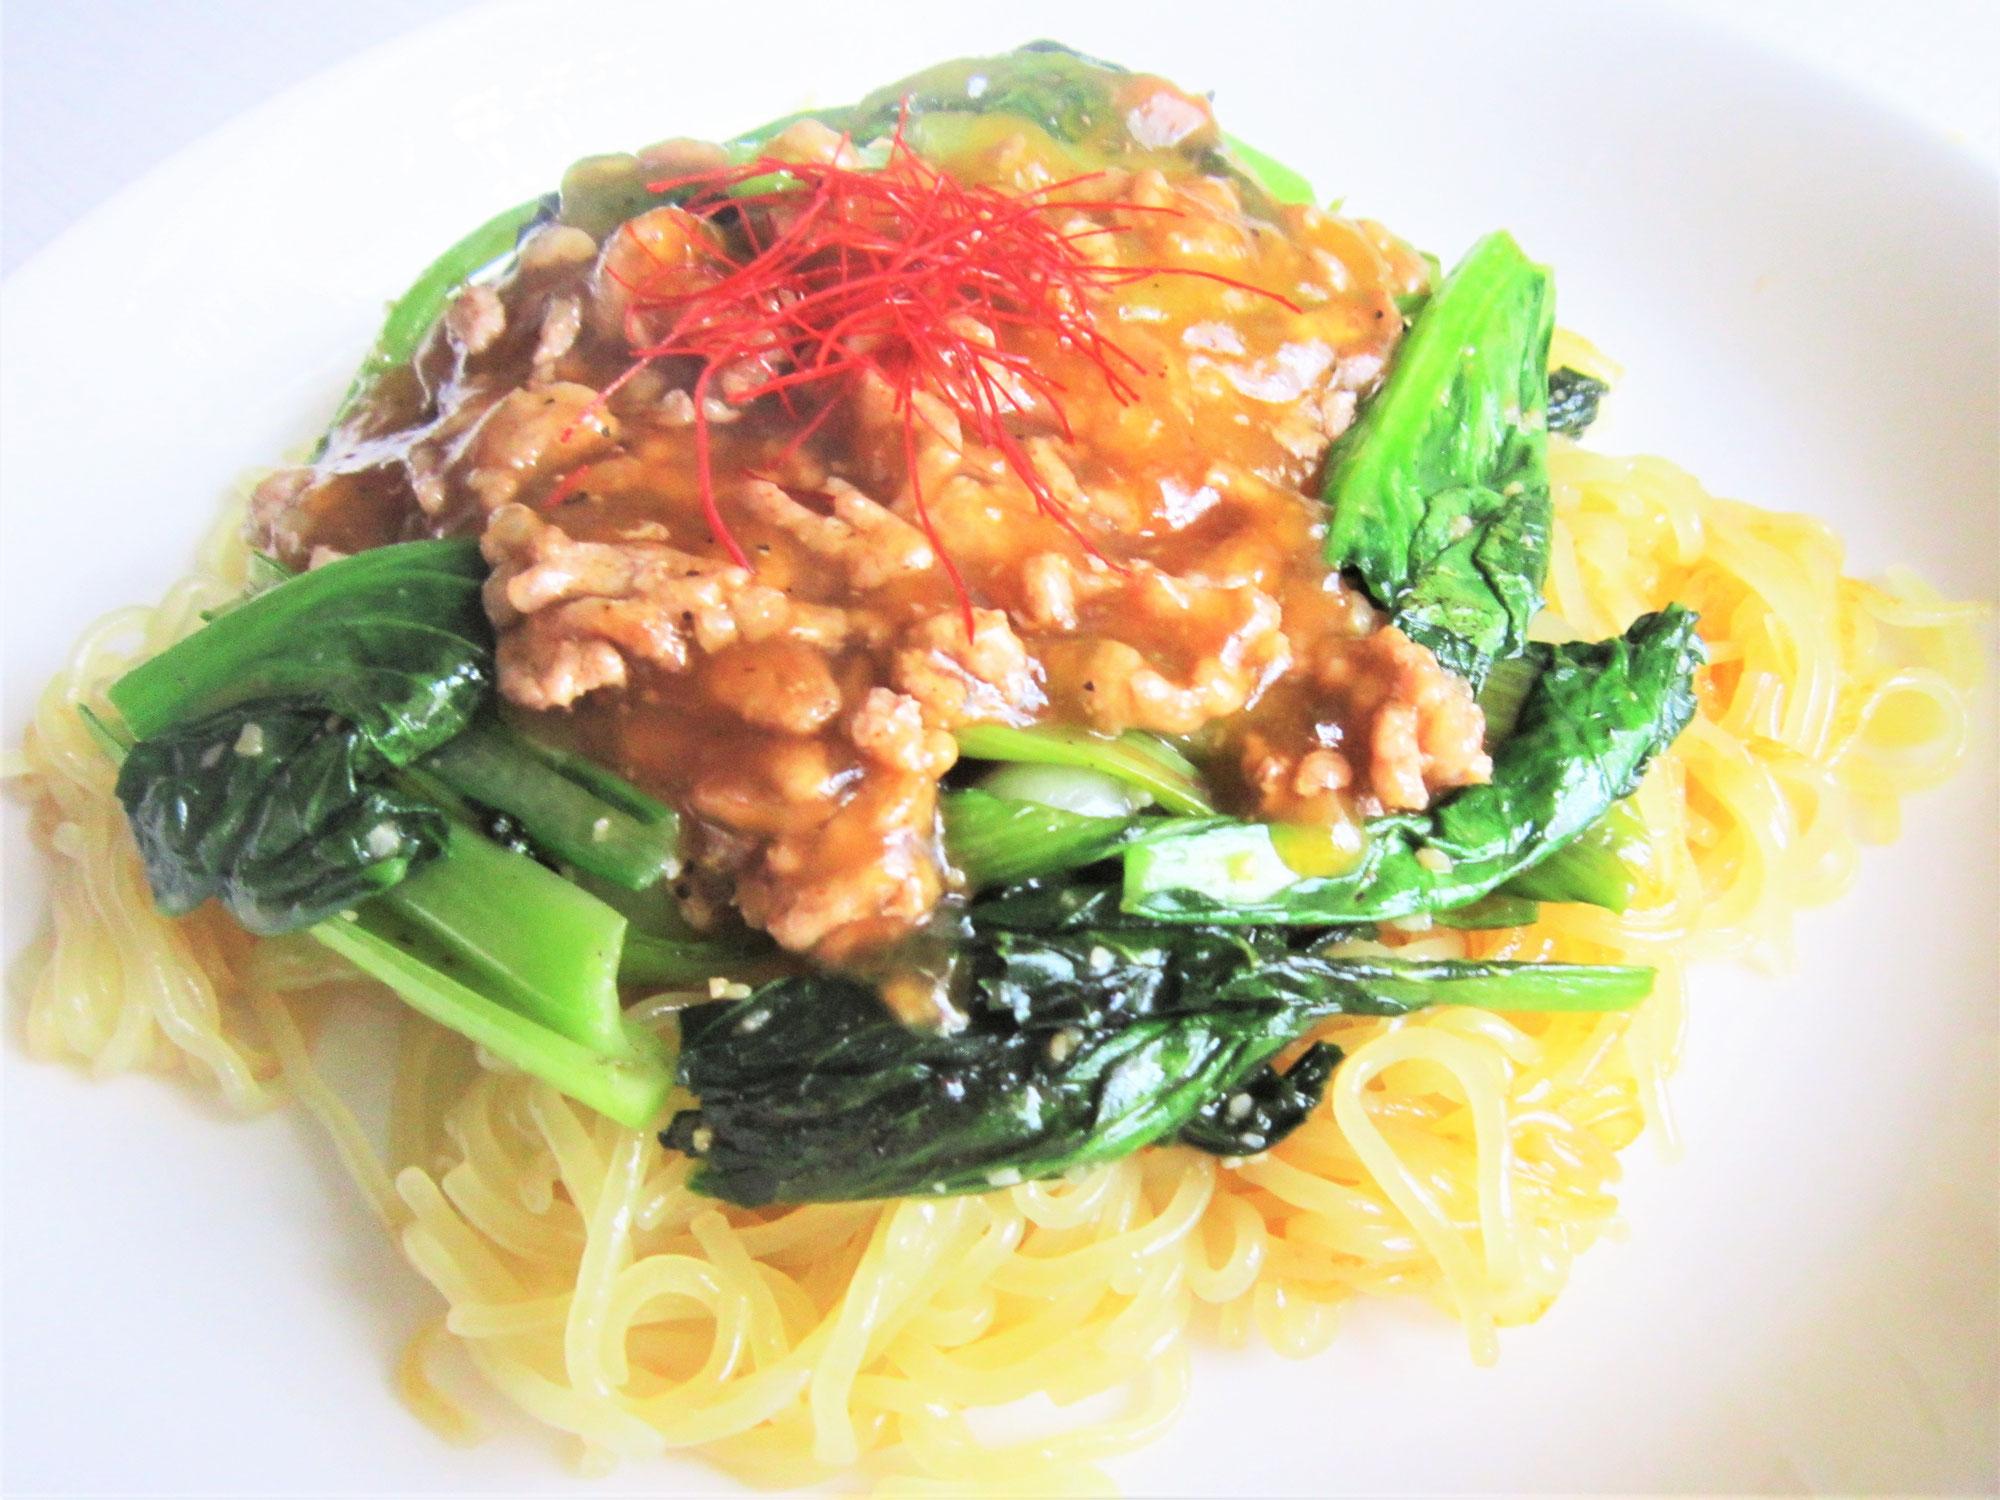 毎日冷麺 28日目 翡翠炒め焼き冷麺